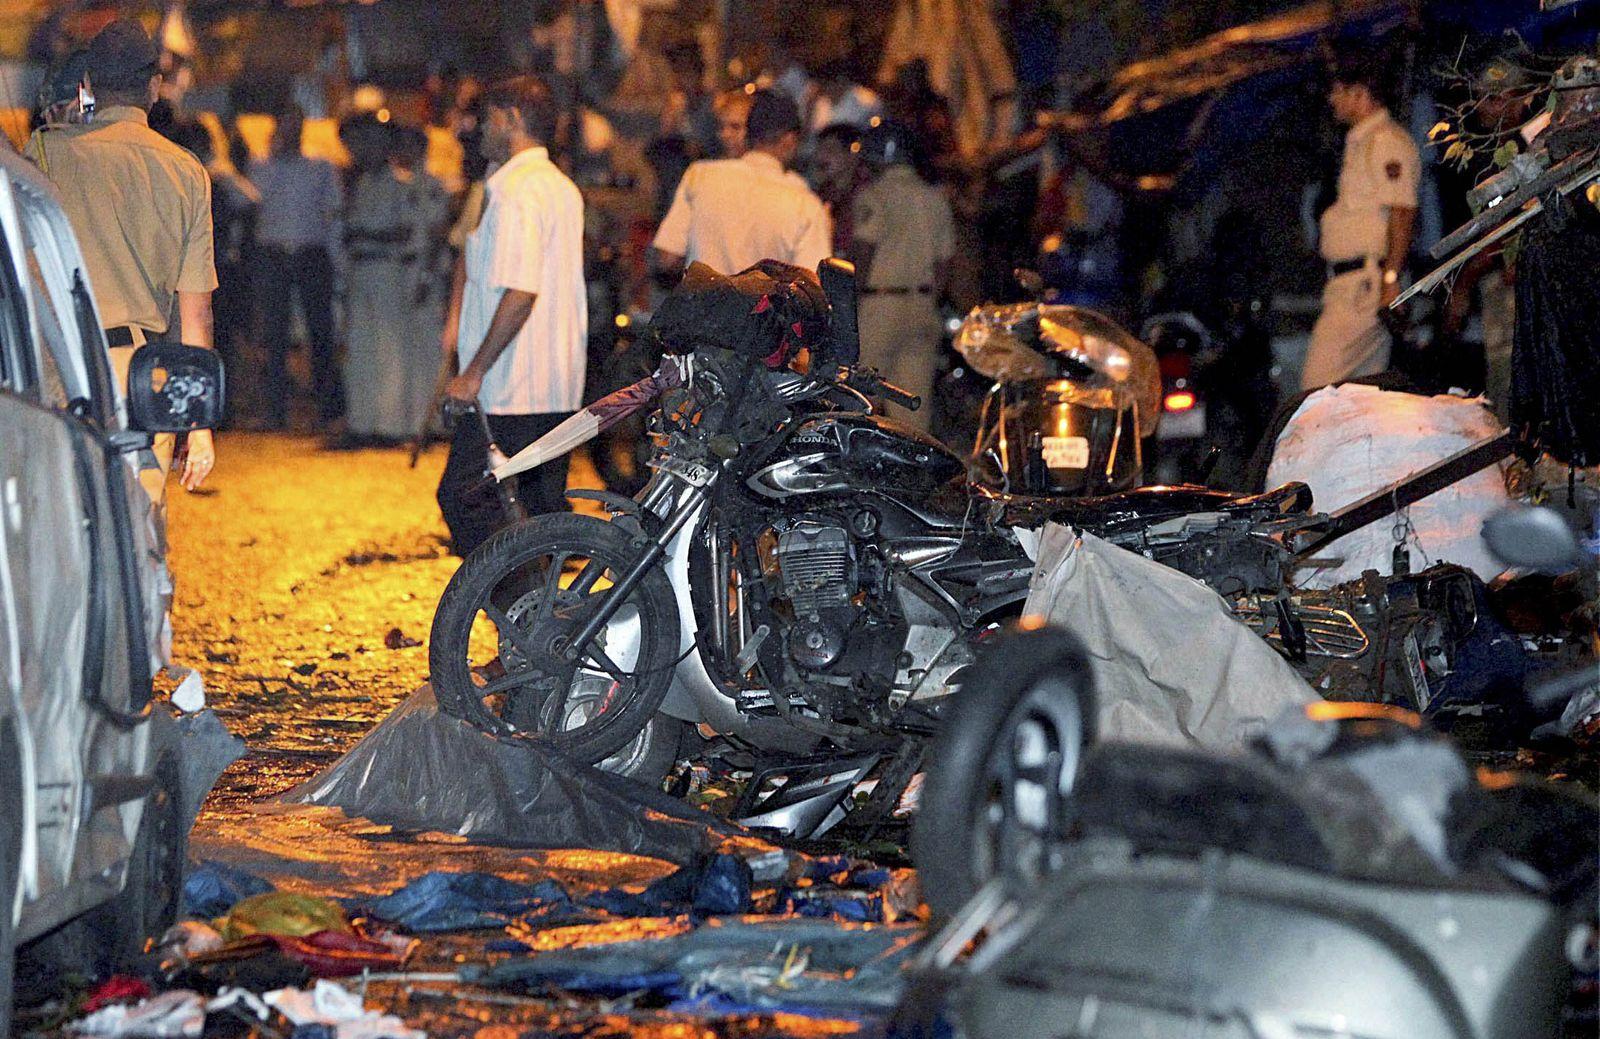 Indien/ Mumbai/ Anschlag